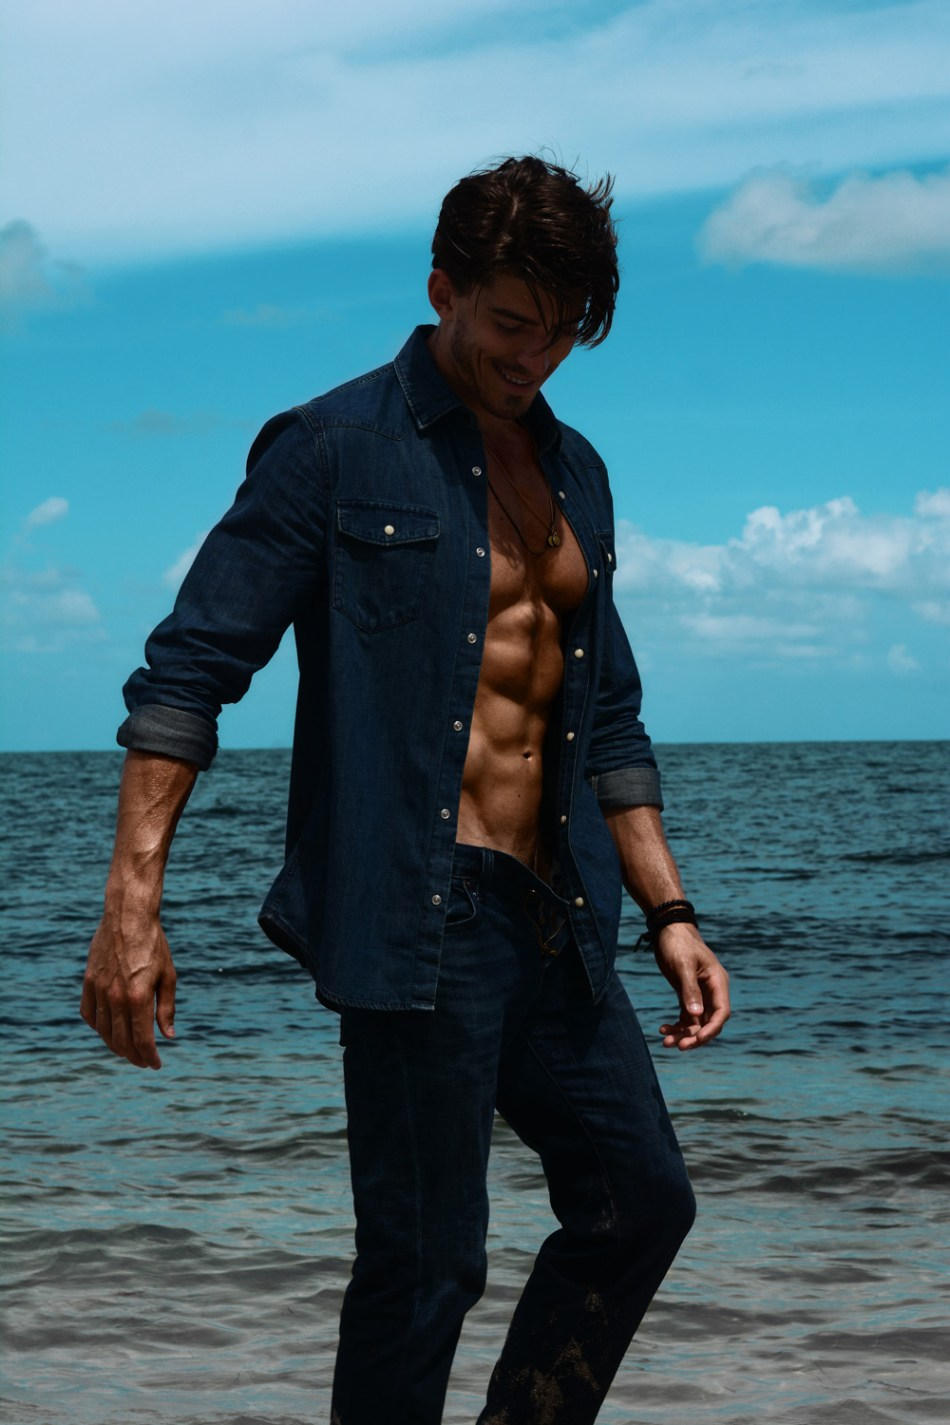 Payton Clarke by Stevan Reyes1